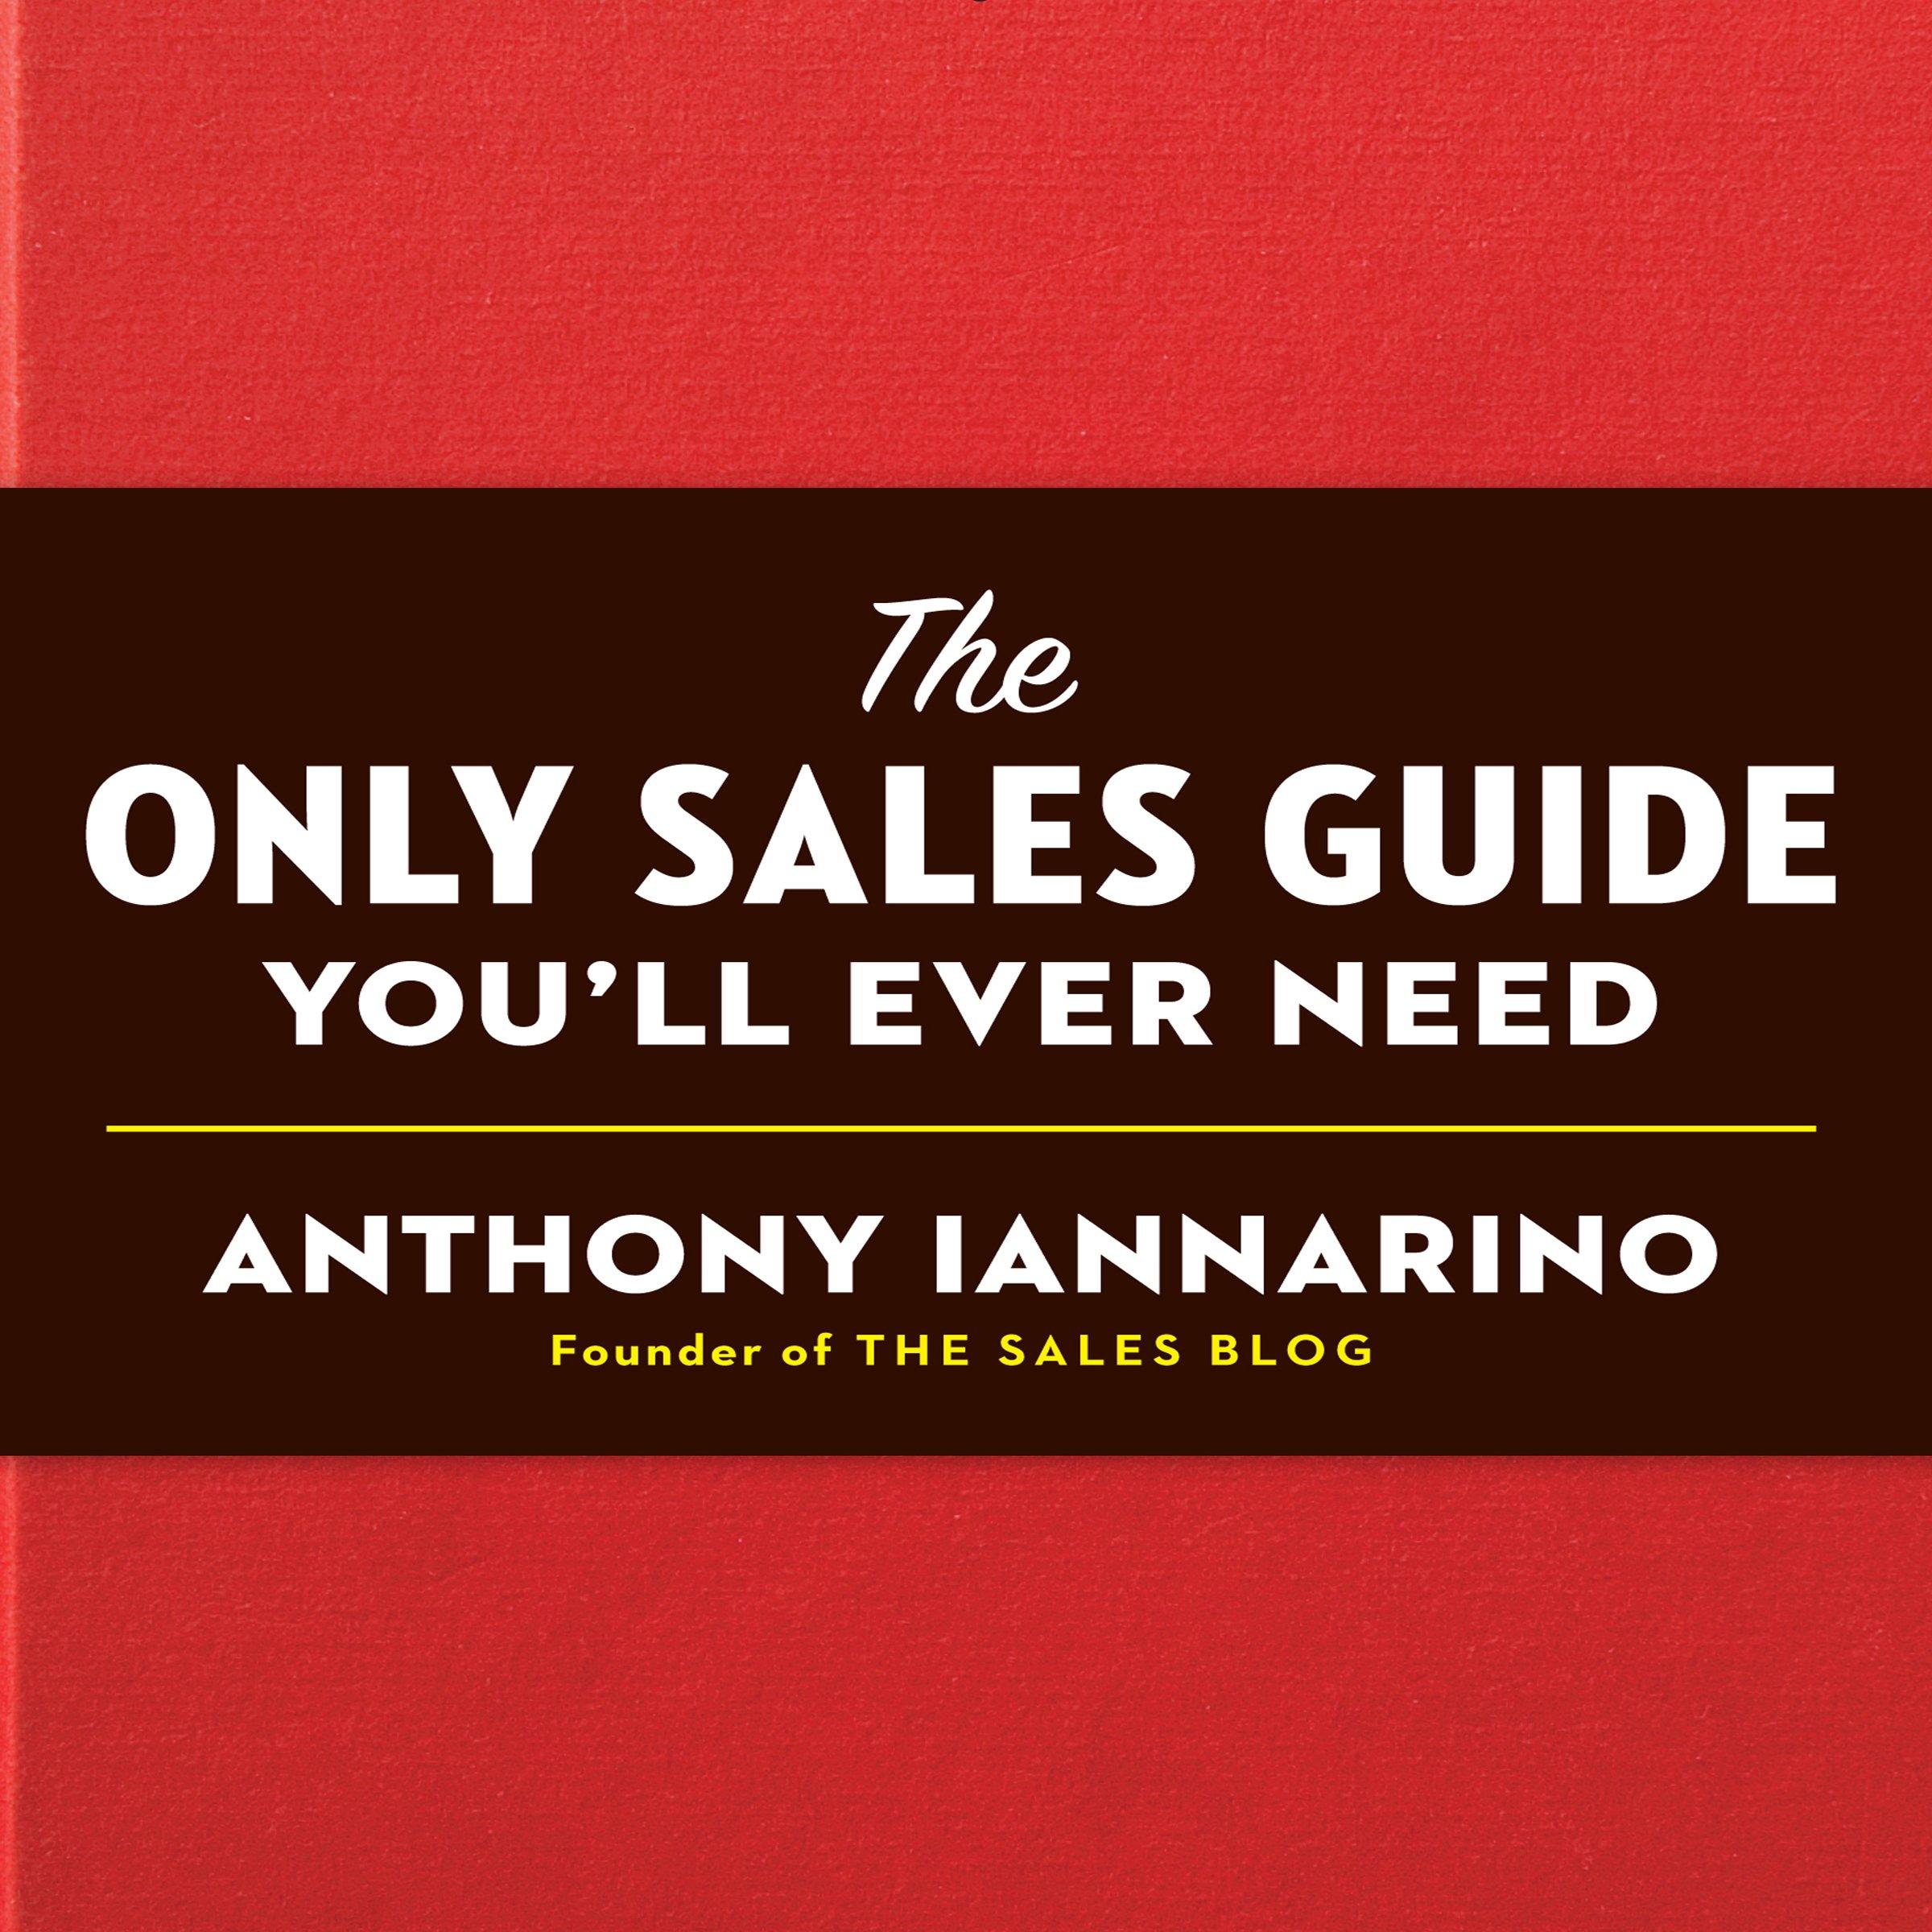 The Only Sales Guide You'll Ever Need: Amazon.es: Anthony Iannarino: Libros  en idiomas extranjeros